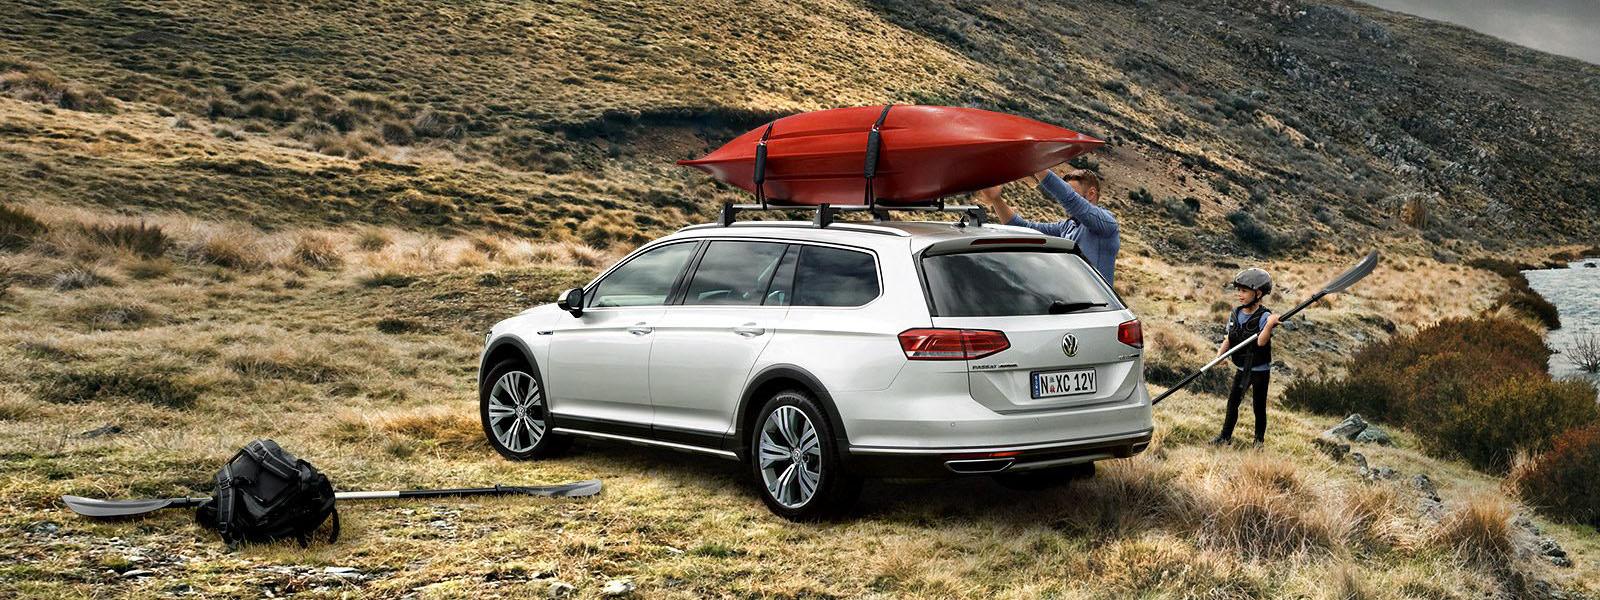 New Volkswagen Passat Alltrack For Sale In Nambour Noosa Maroochydore Kunda Park Sunshine Coast Cricks